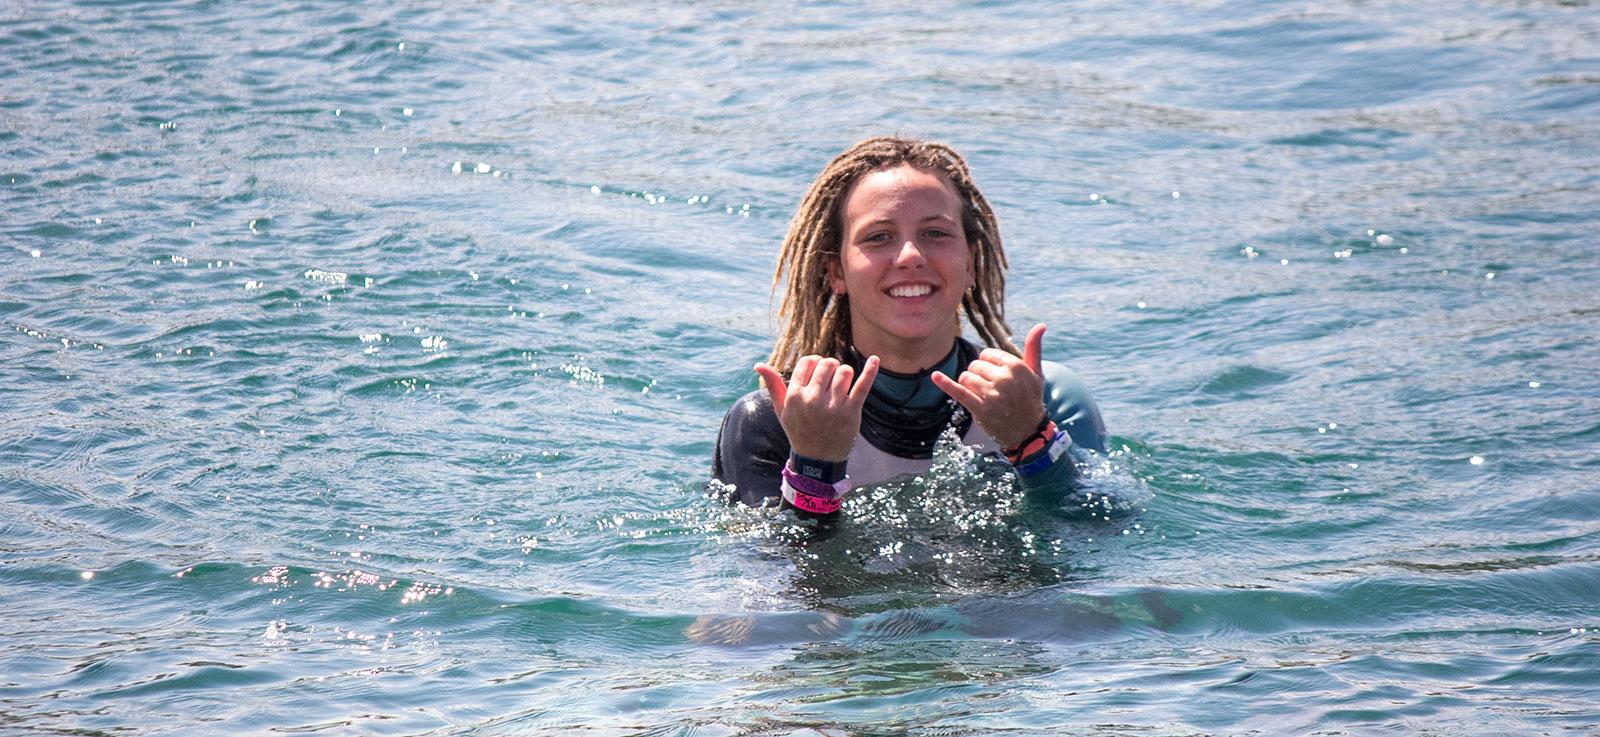 Megan Nel wakeboarder